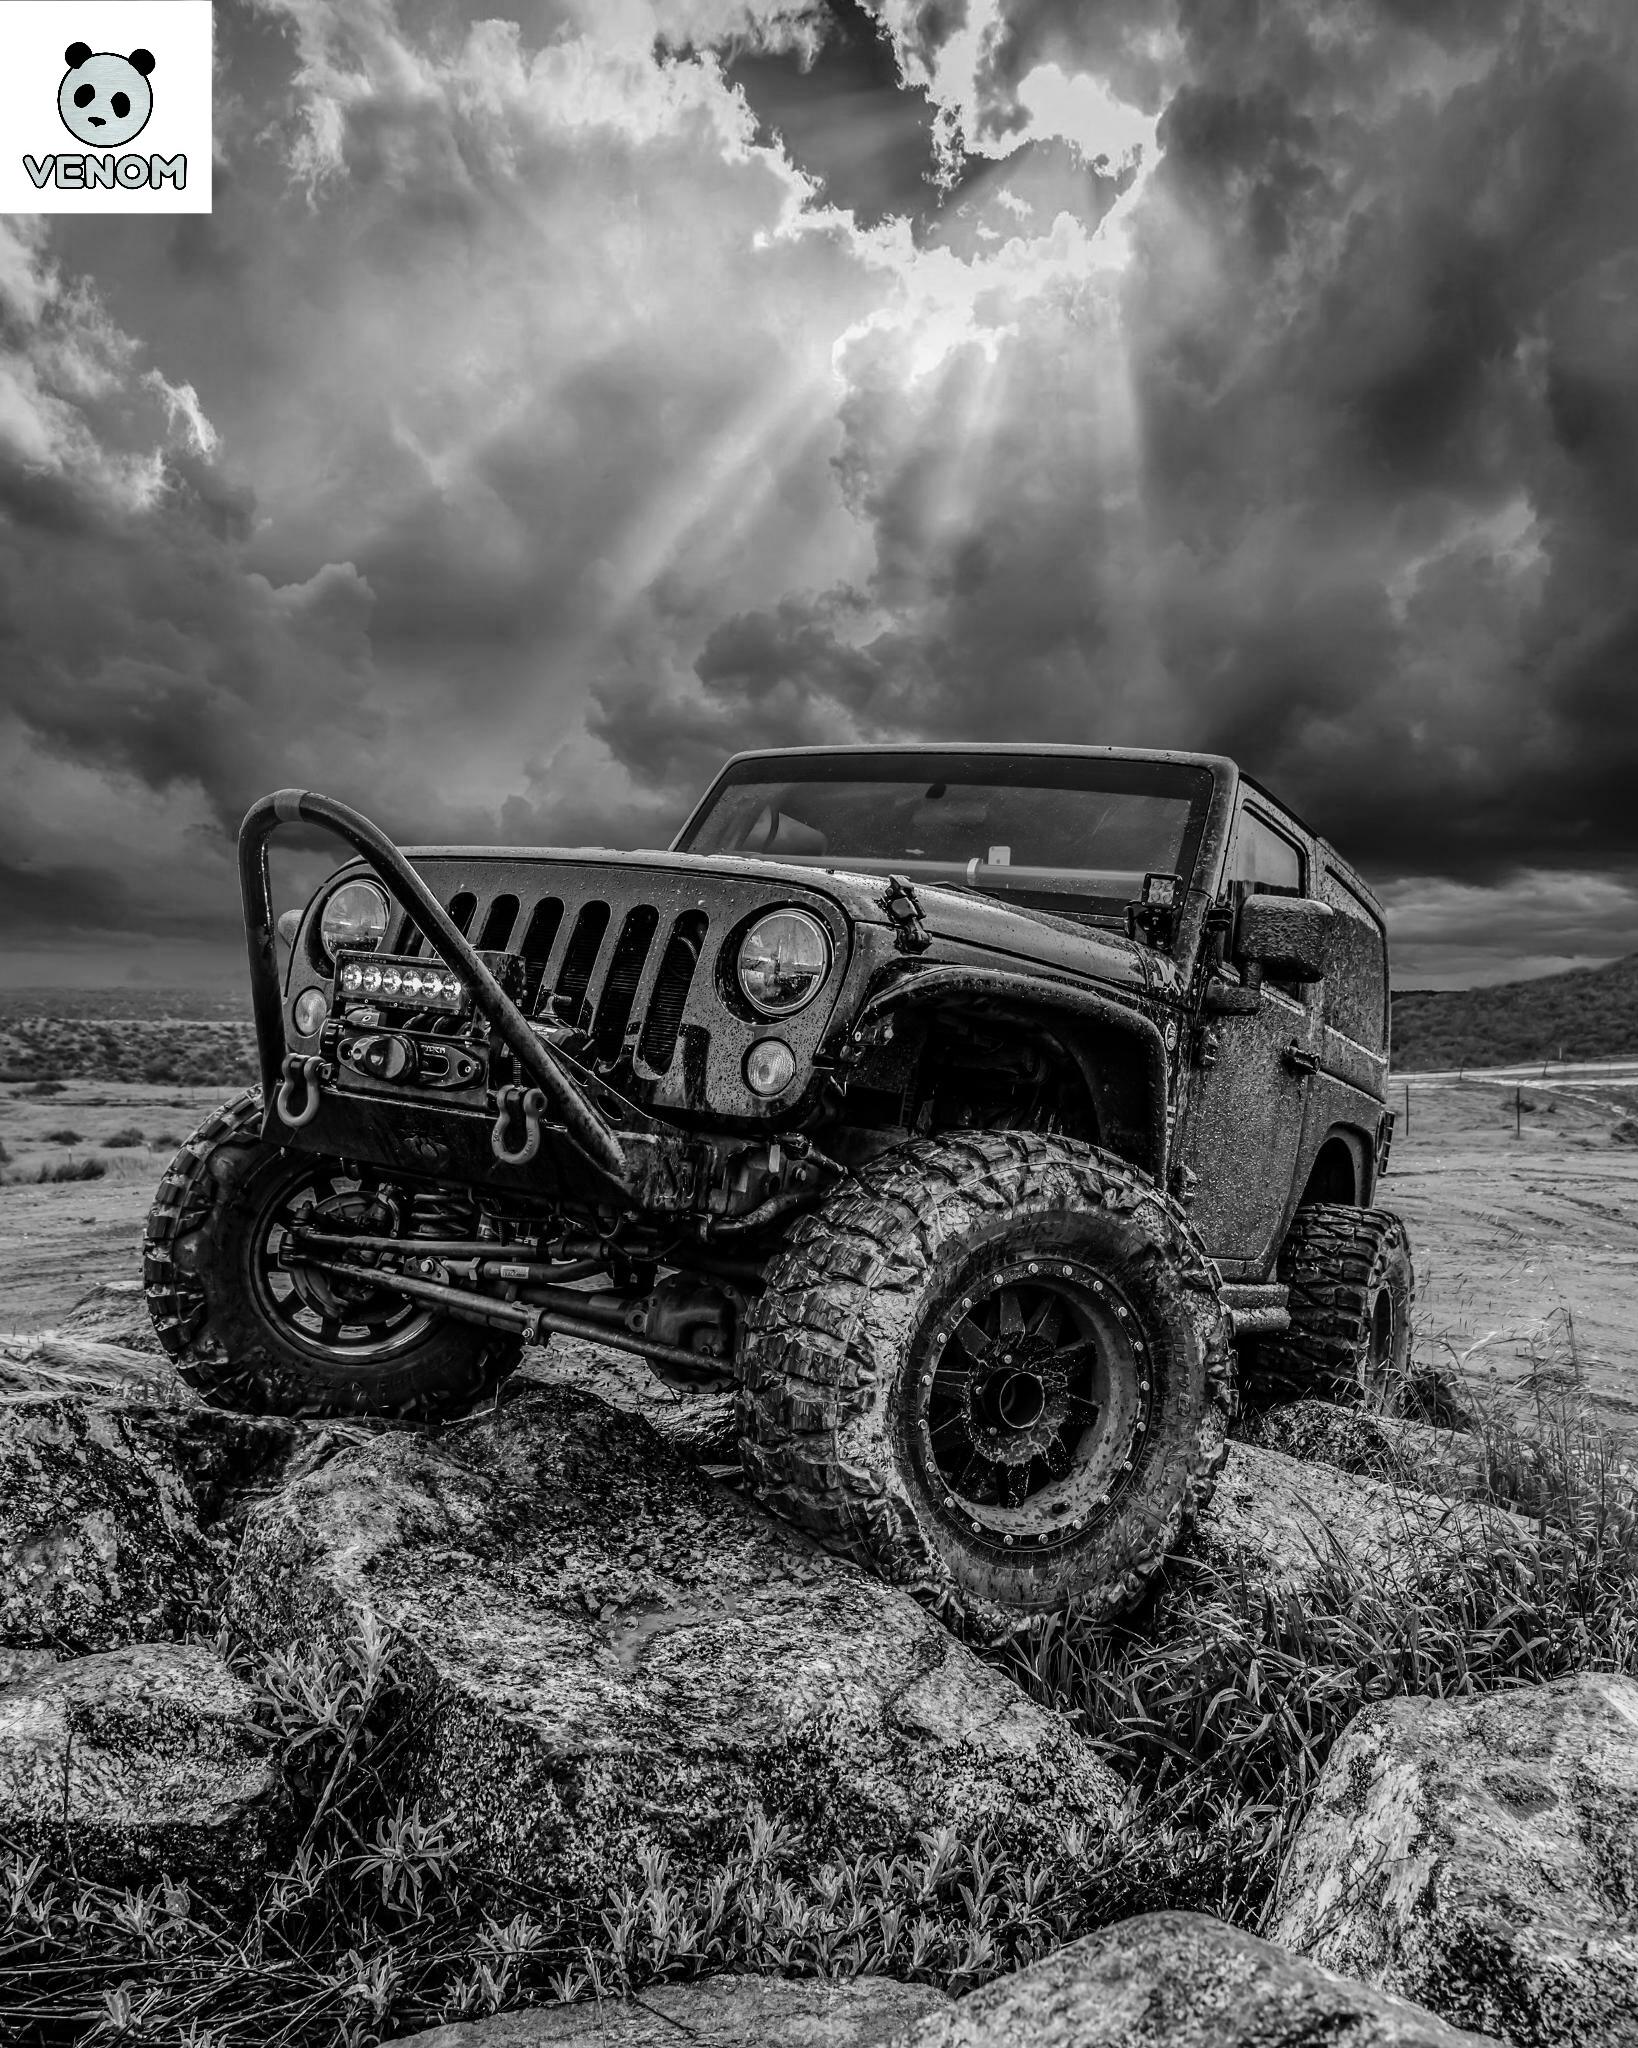 Jeep Similar Hashtags Picsart Jeep cb backgrounds background images for editing picsart. picsart